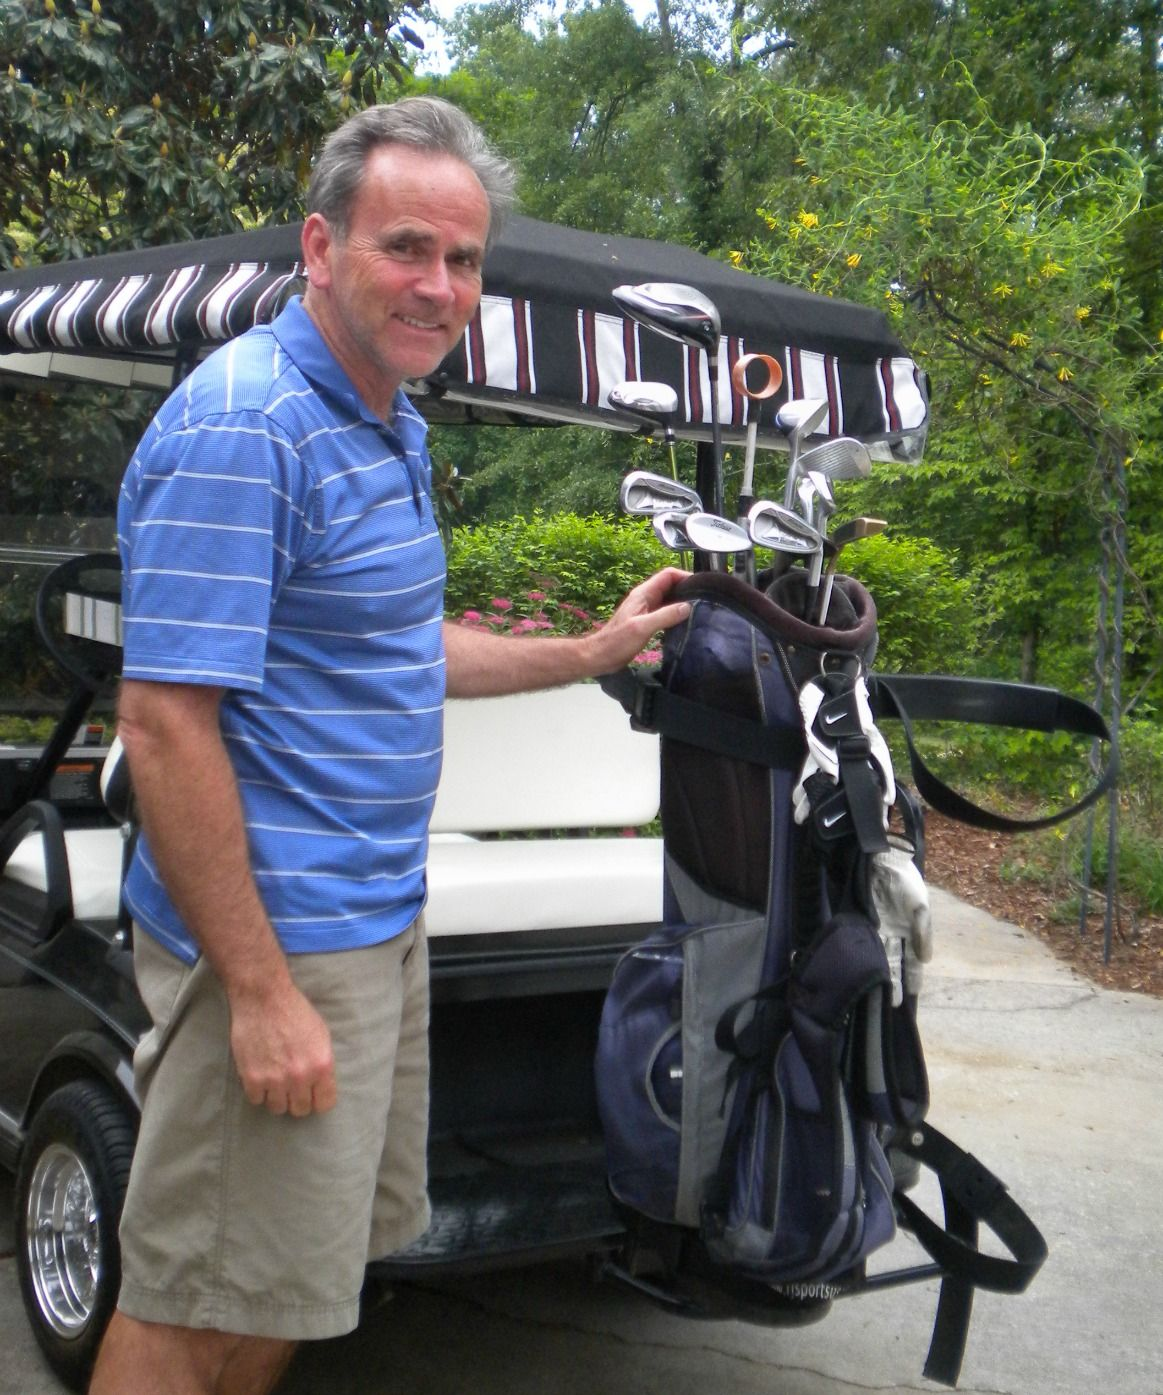 Golf Bag Rack - Golf Cart Golf Bag Holder for 2 or 4 Seat Golf Cart Precedent Golf Cart Rear Bag Holder Racks on golf cart front bumper, golf cart safety bar, golf cart trails, golf cart rear-seat, golf cart umbrella mounting attachment, golf cart roll bar, golf bag storage rack, golf cart bag holder, golf cart trailers, golf cart cup holder, golf cart fog lights, golf cart storage racks, golf cart umbrella holder, golf cart straps, golf cart parts now, golf cart roof rack, golf cart roof lights, golf cart sand bottle holder, golf cart bag attachment, golf bag rack for motorcycle,